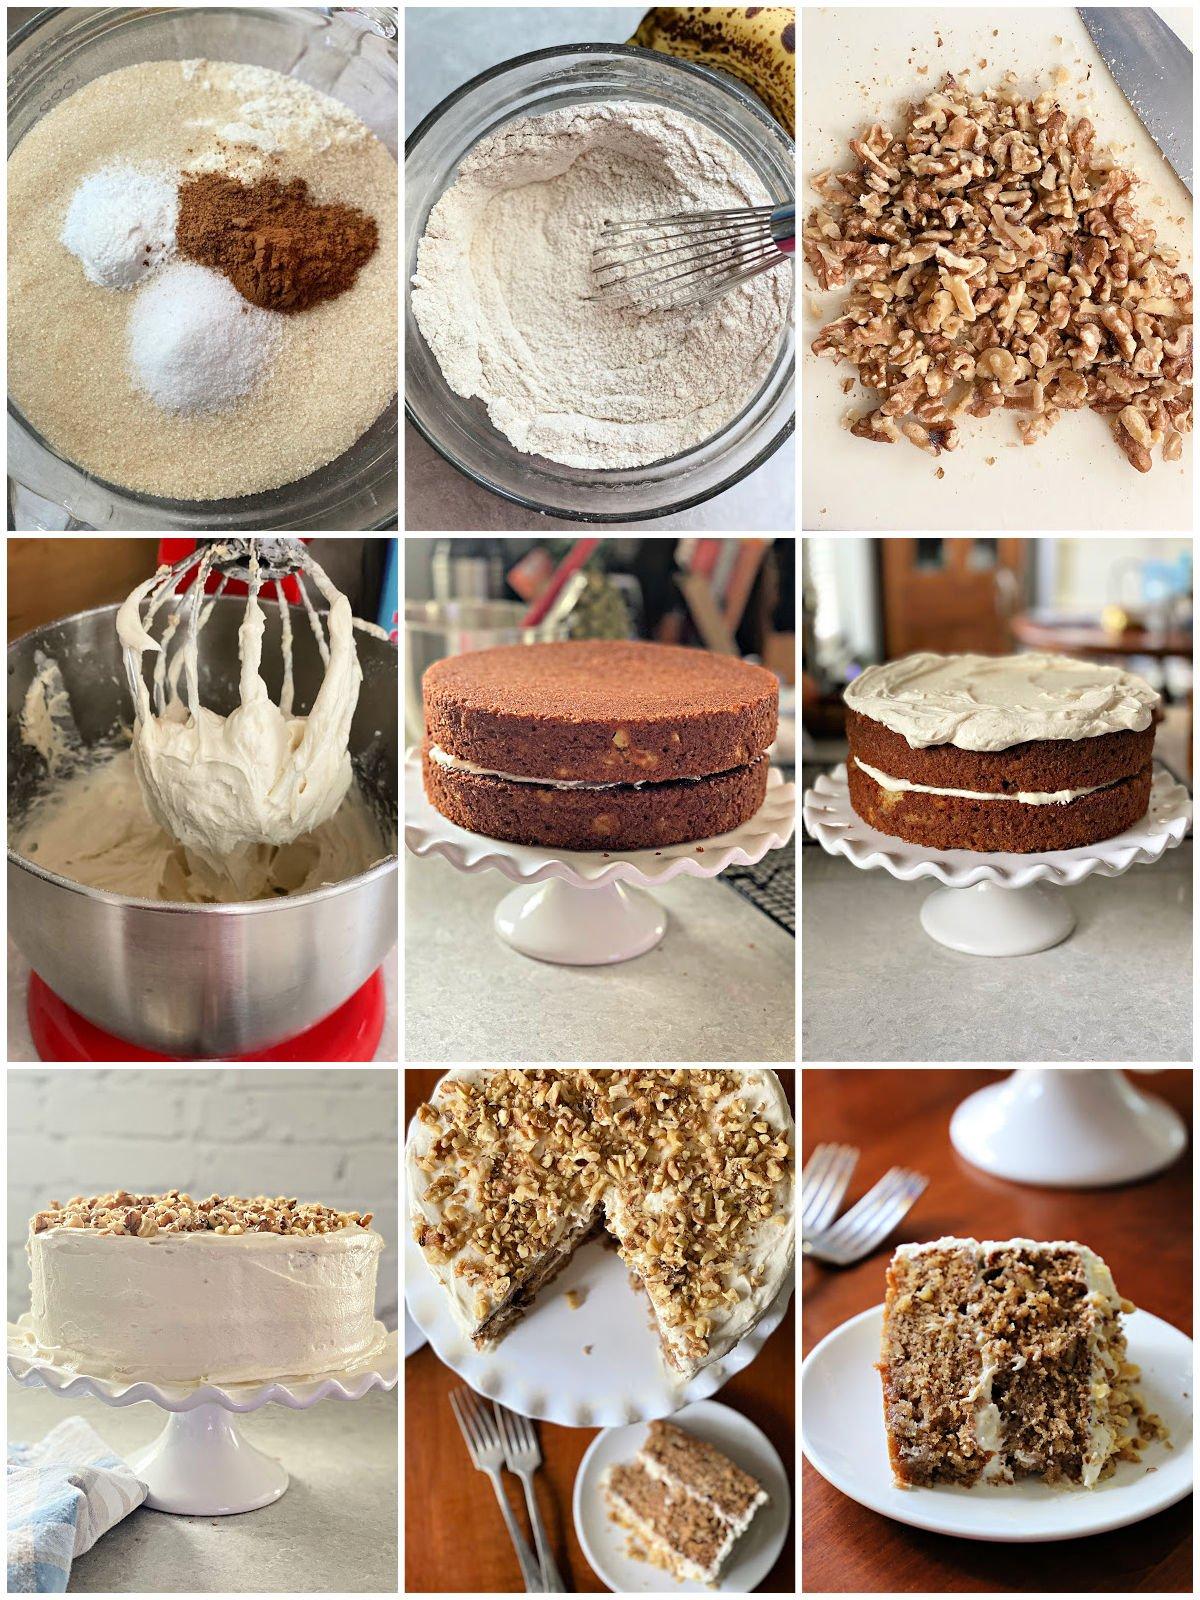 steps of making a hummingbird cake